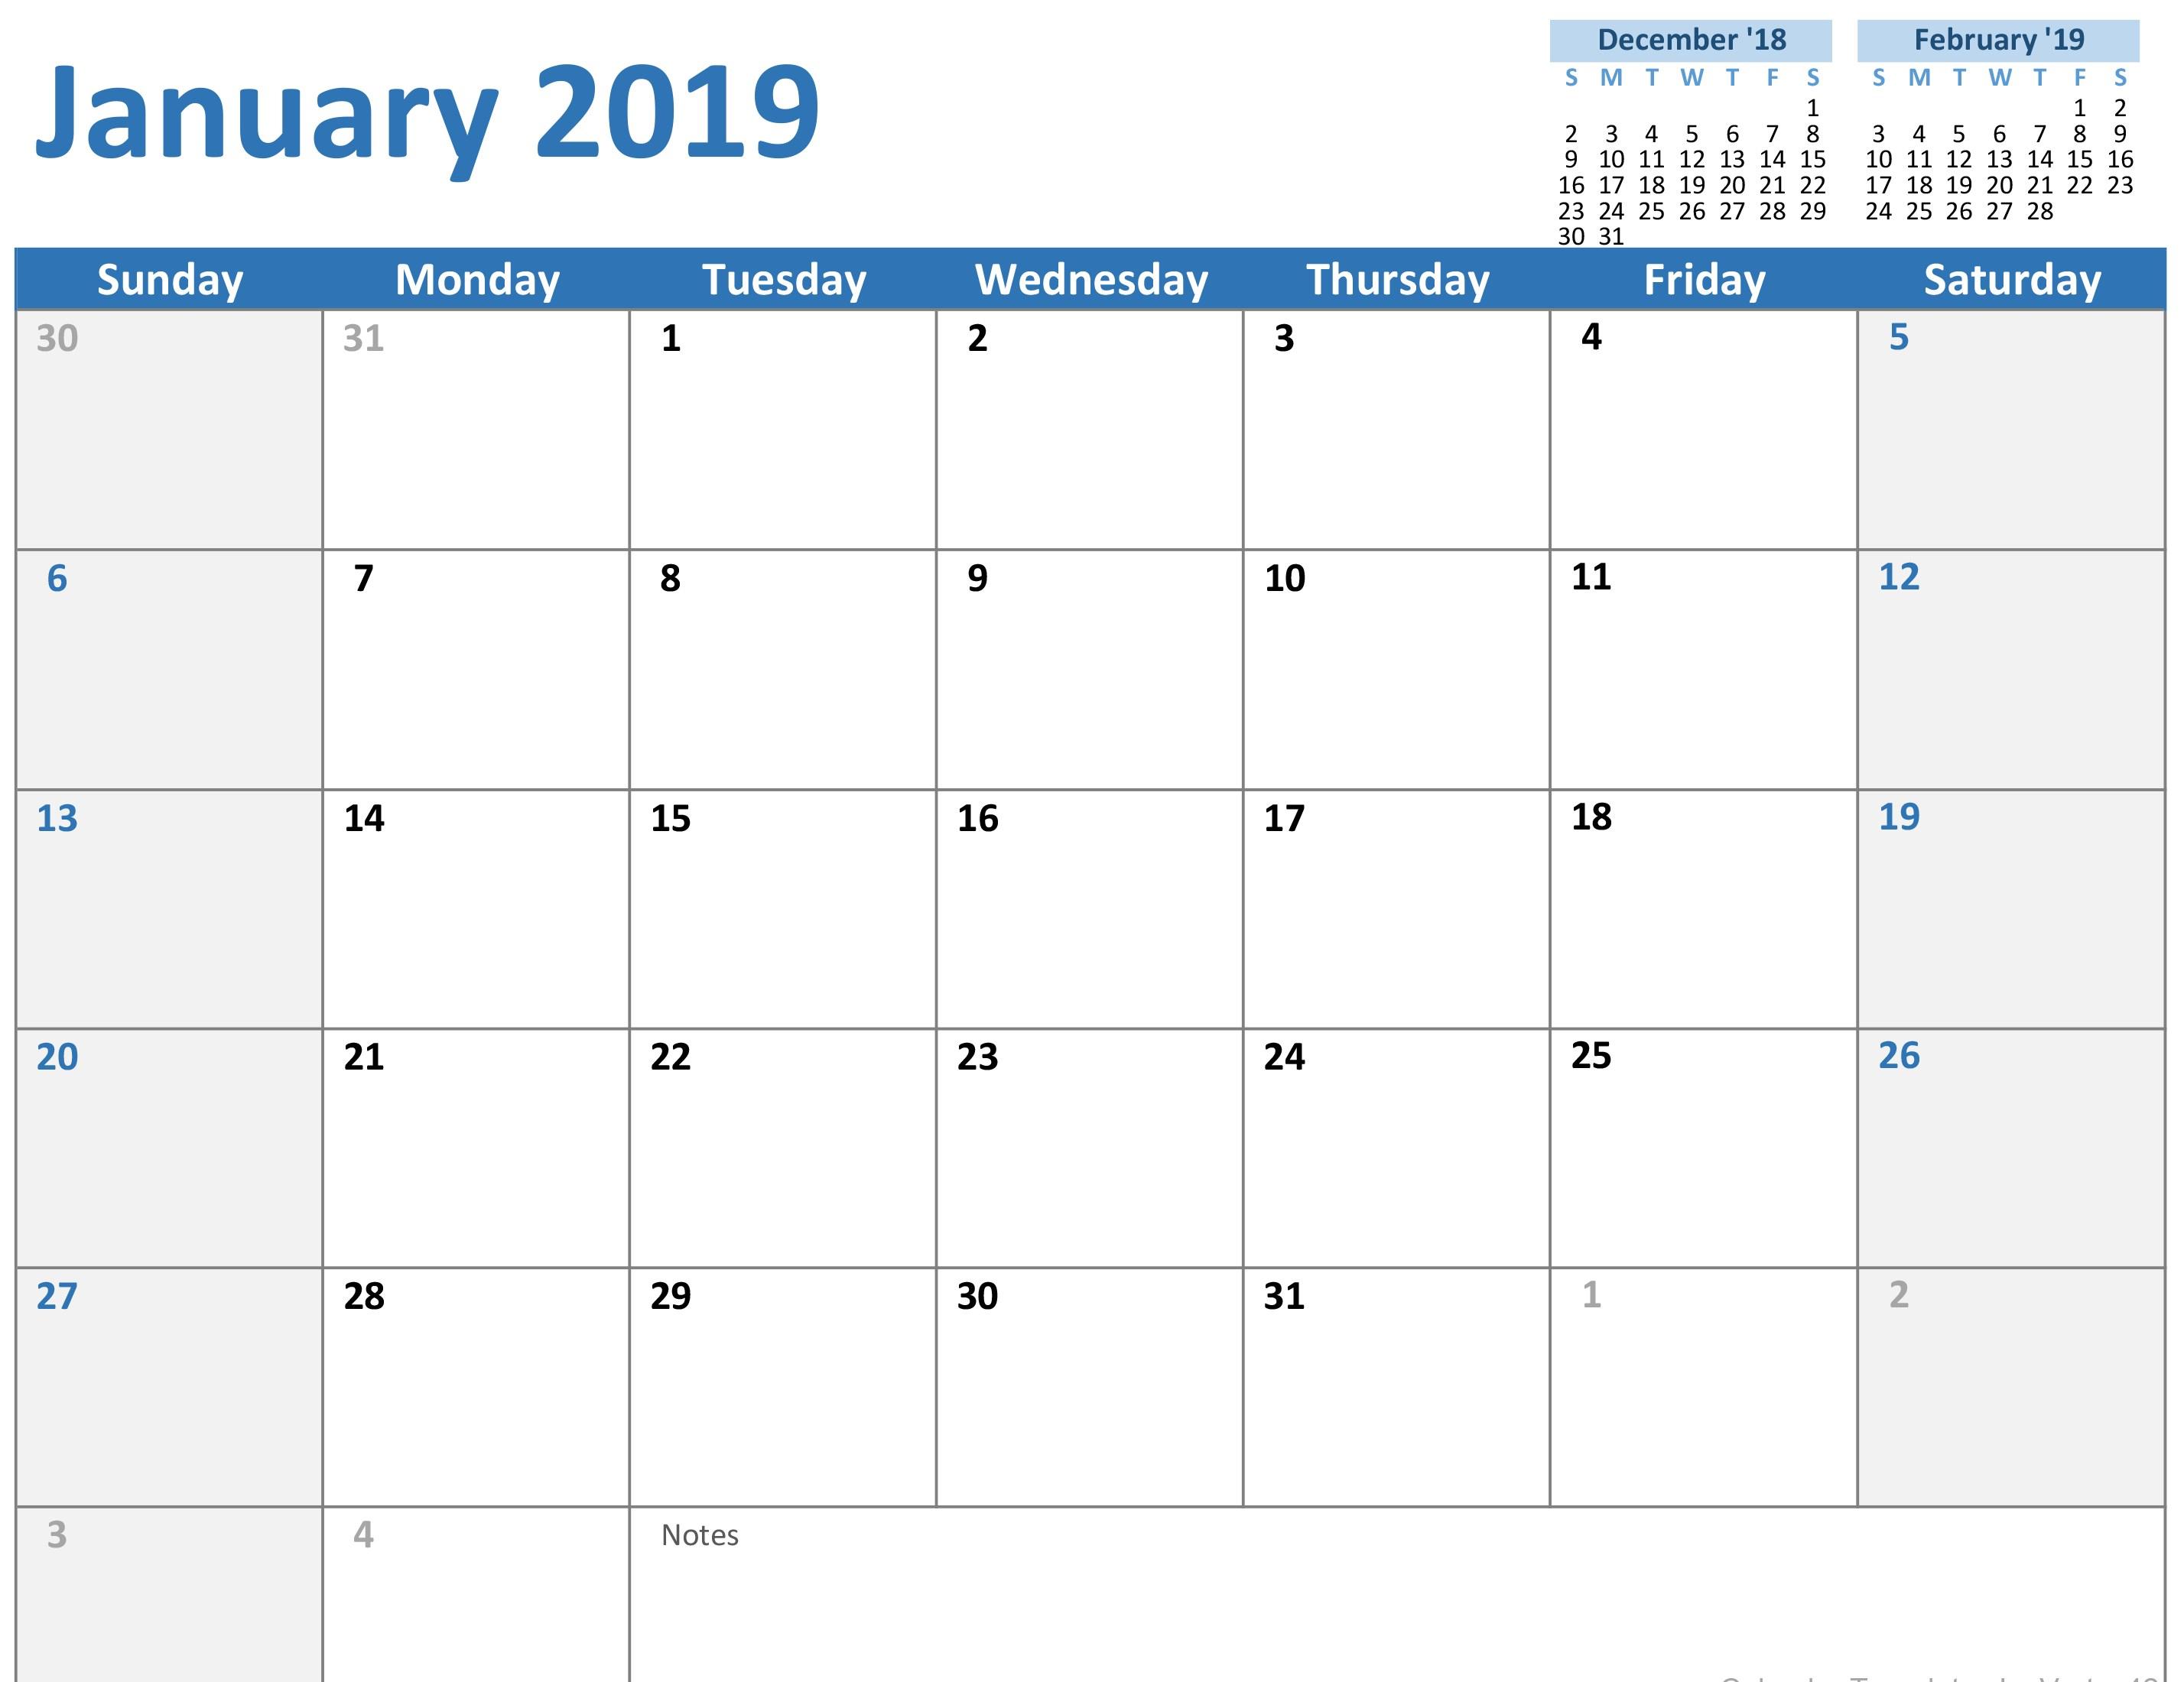 Monthly Calendar Spreadsheet Throughout Calendars  Office